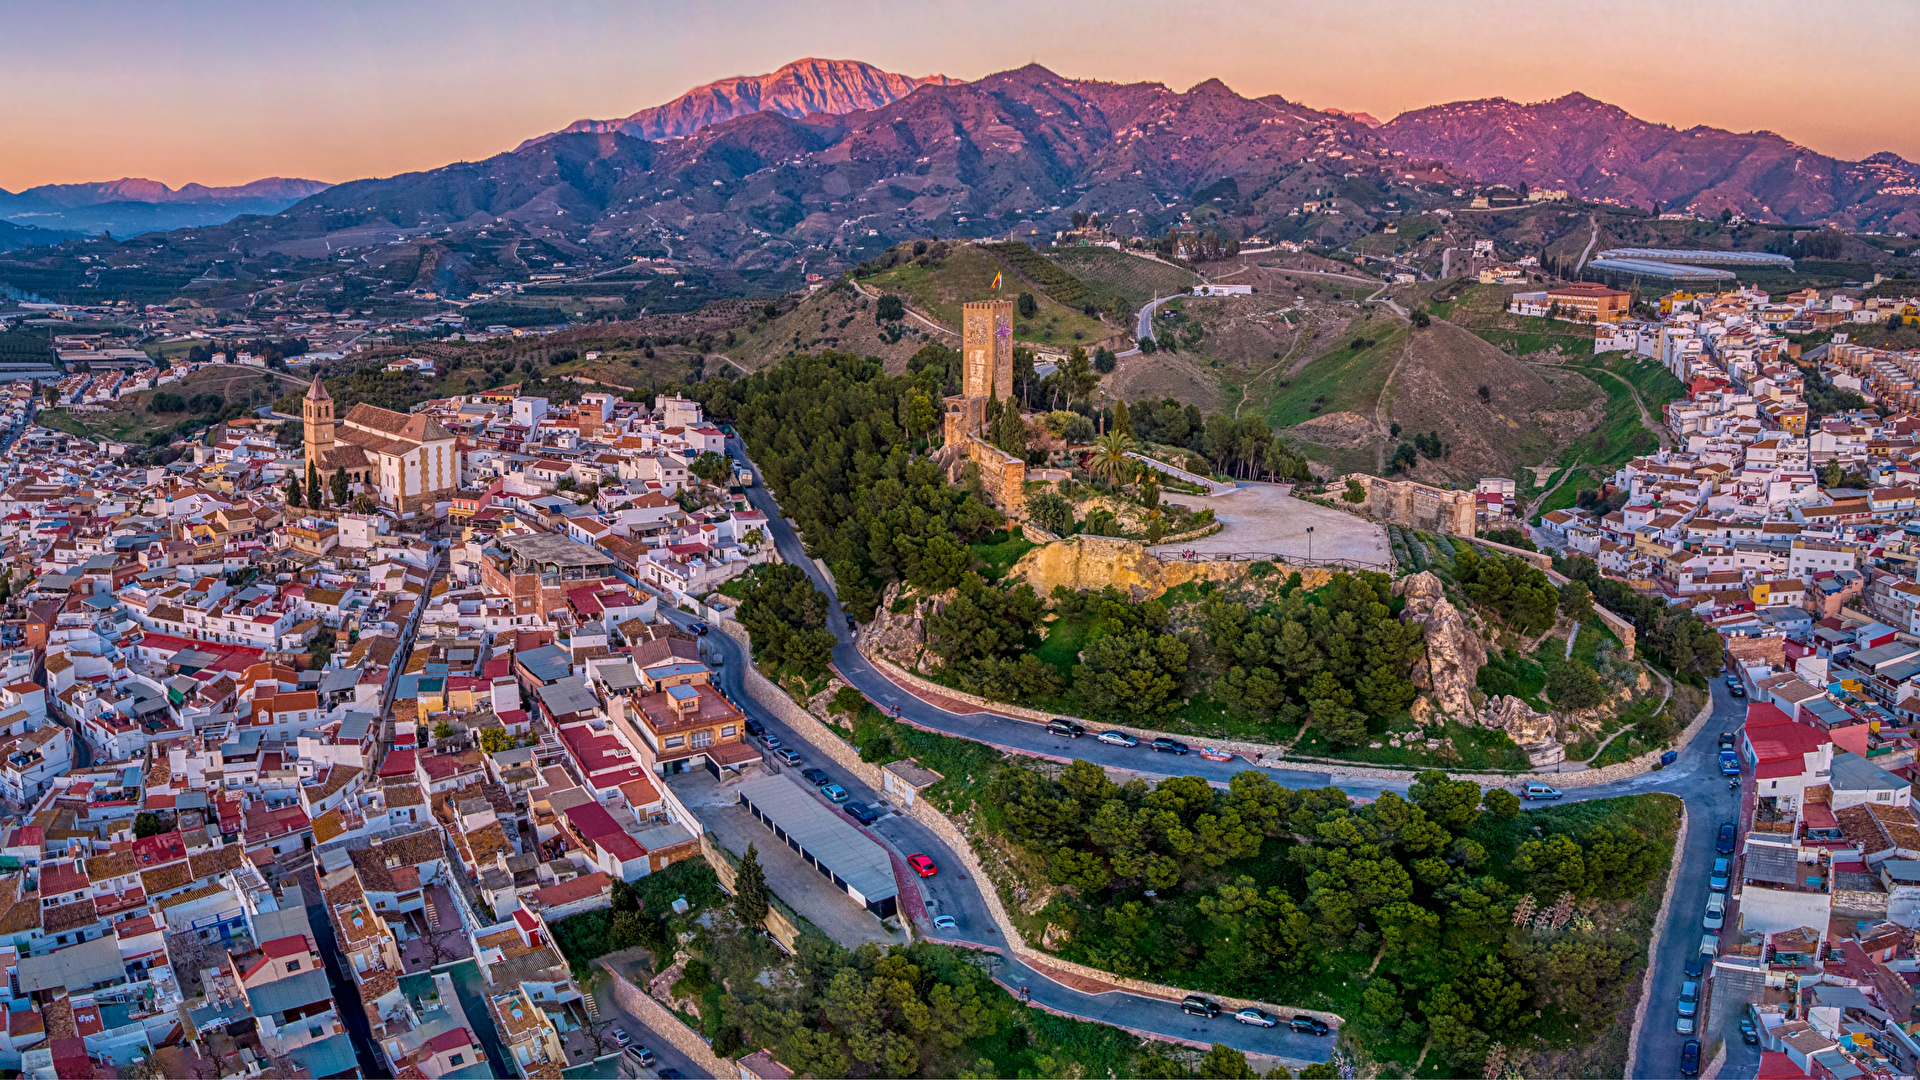 Картинки Испания Malaga холмов Дороги Сверху Дома Города 1920x1080 холм Холмы город Здания